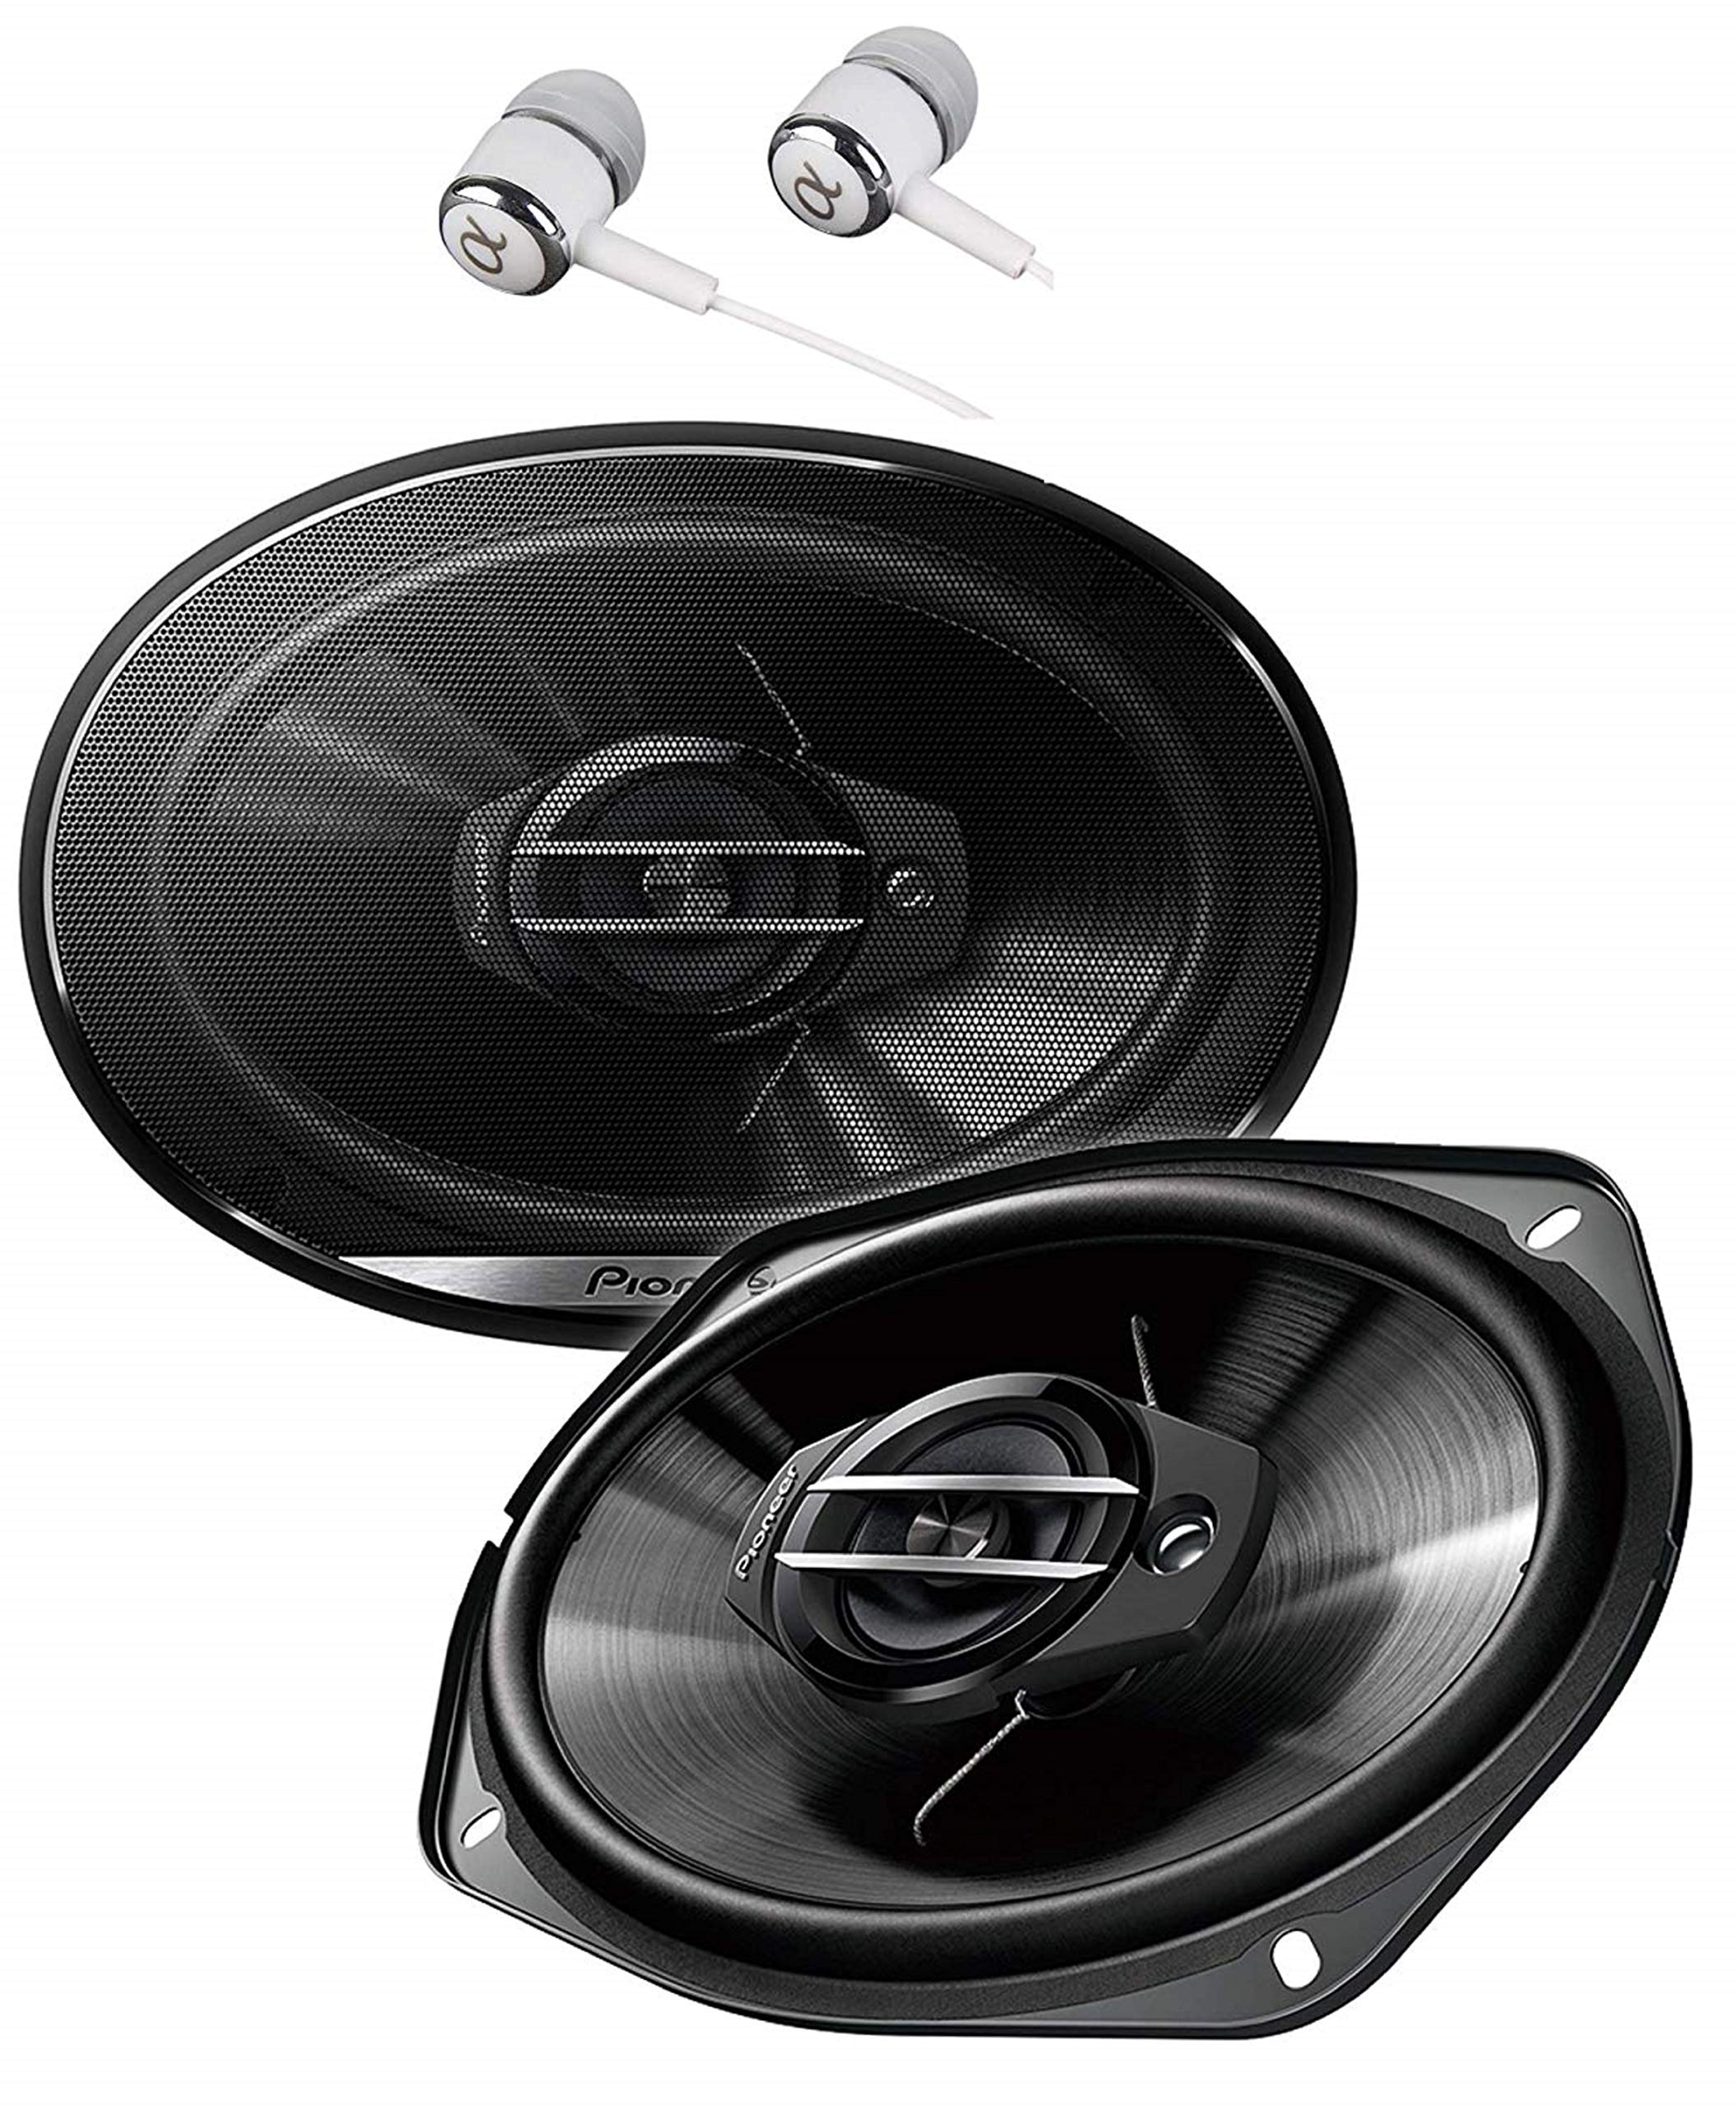 Pioneer TS-G6930F 800 Watts Max Power 6 x 9'' 3-Way G-Series Coaxial Full Range Car Audio Stereo Speakers by PIONEER